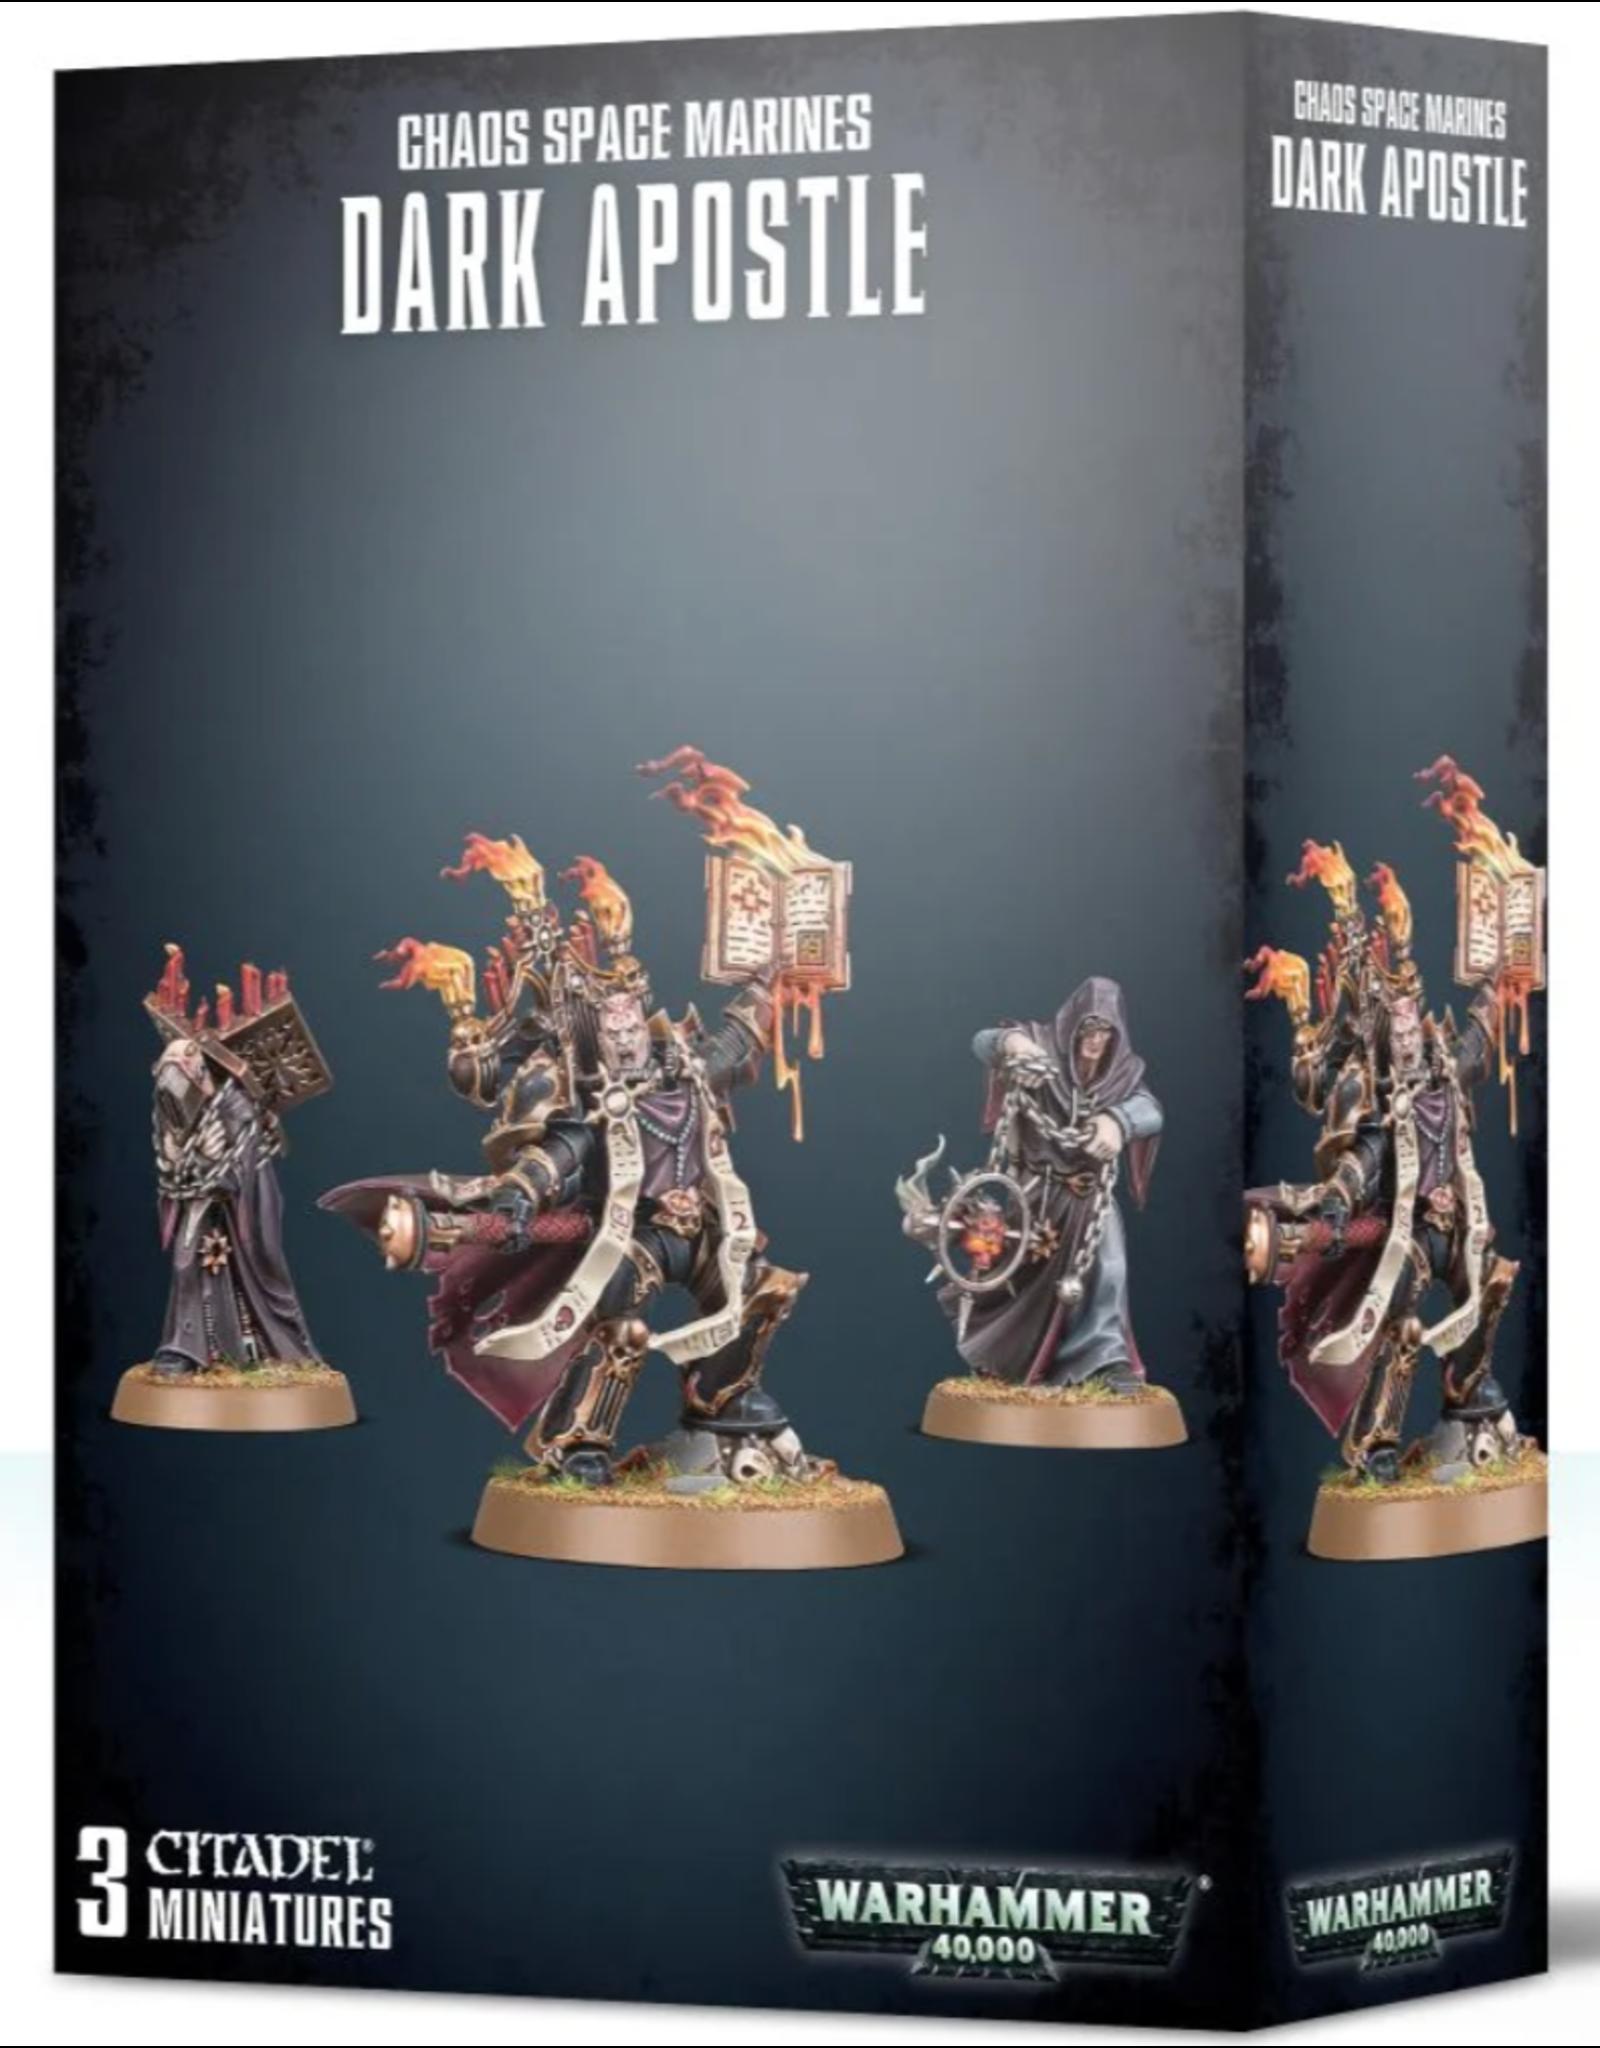 Warhammer 40K Chaos Space Marines Dark Apostle